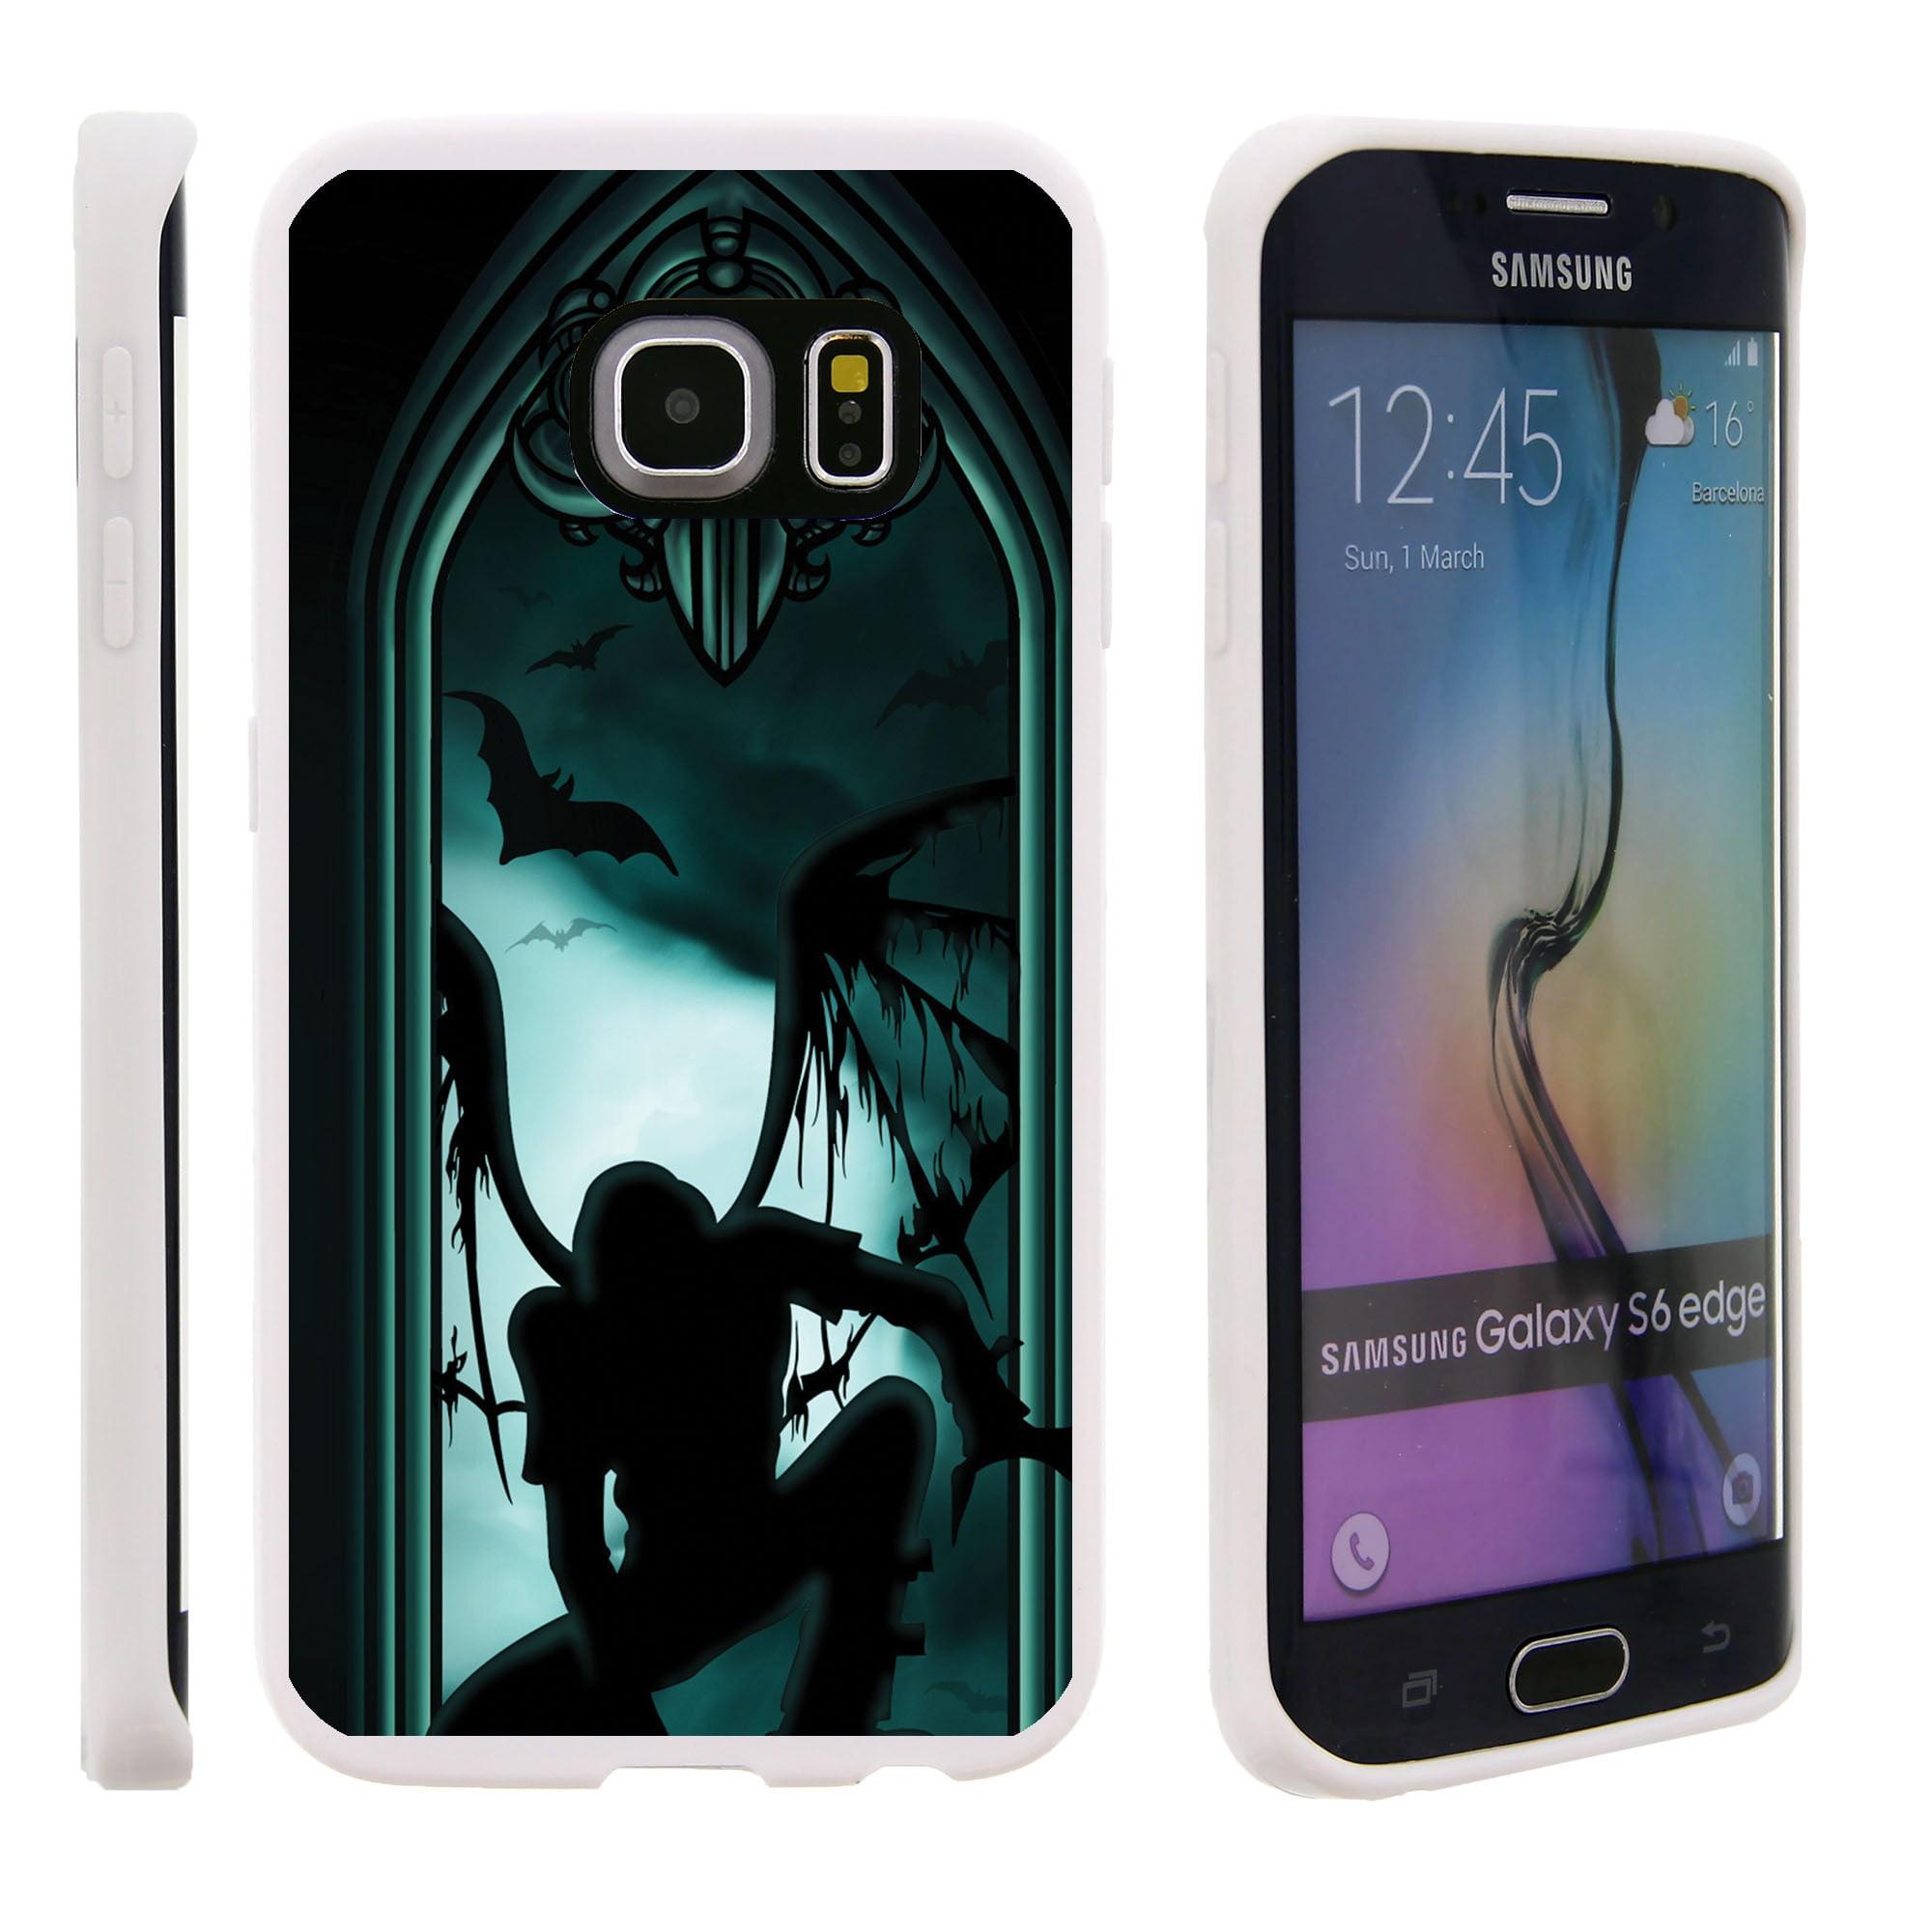 Samsung Galaxy S6 Edge G925, Flexible Case [FLEX FORCE] Slim Durable TPU Sleek Bumper with Unique Designs - Person in the Dark